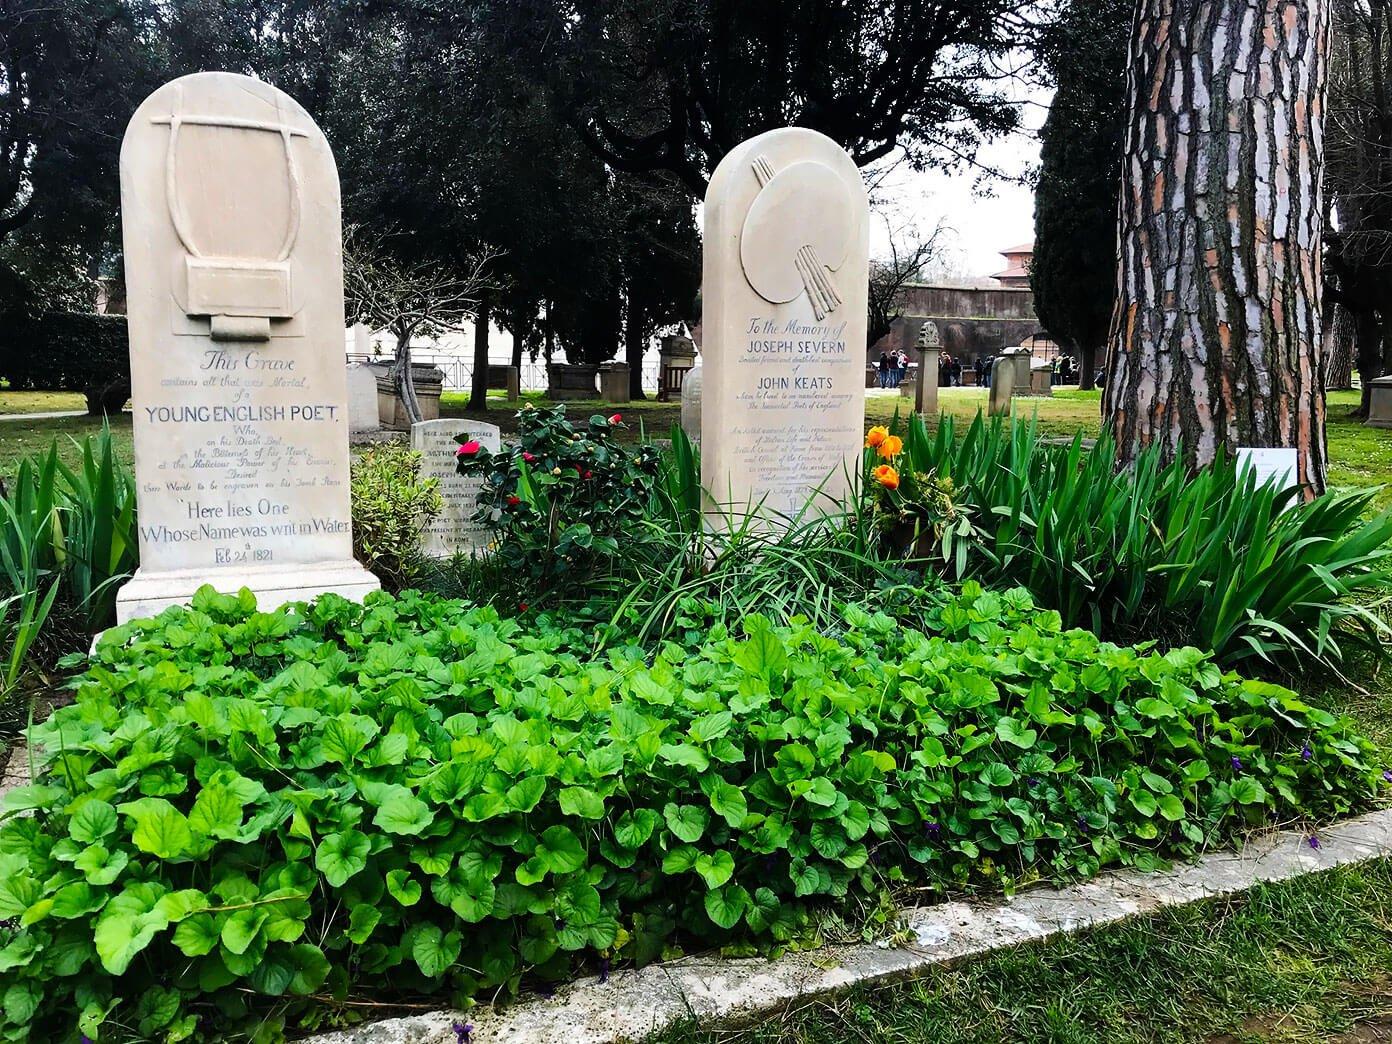 John Keats' Grave in Rome